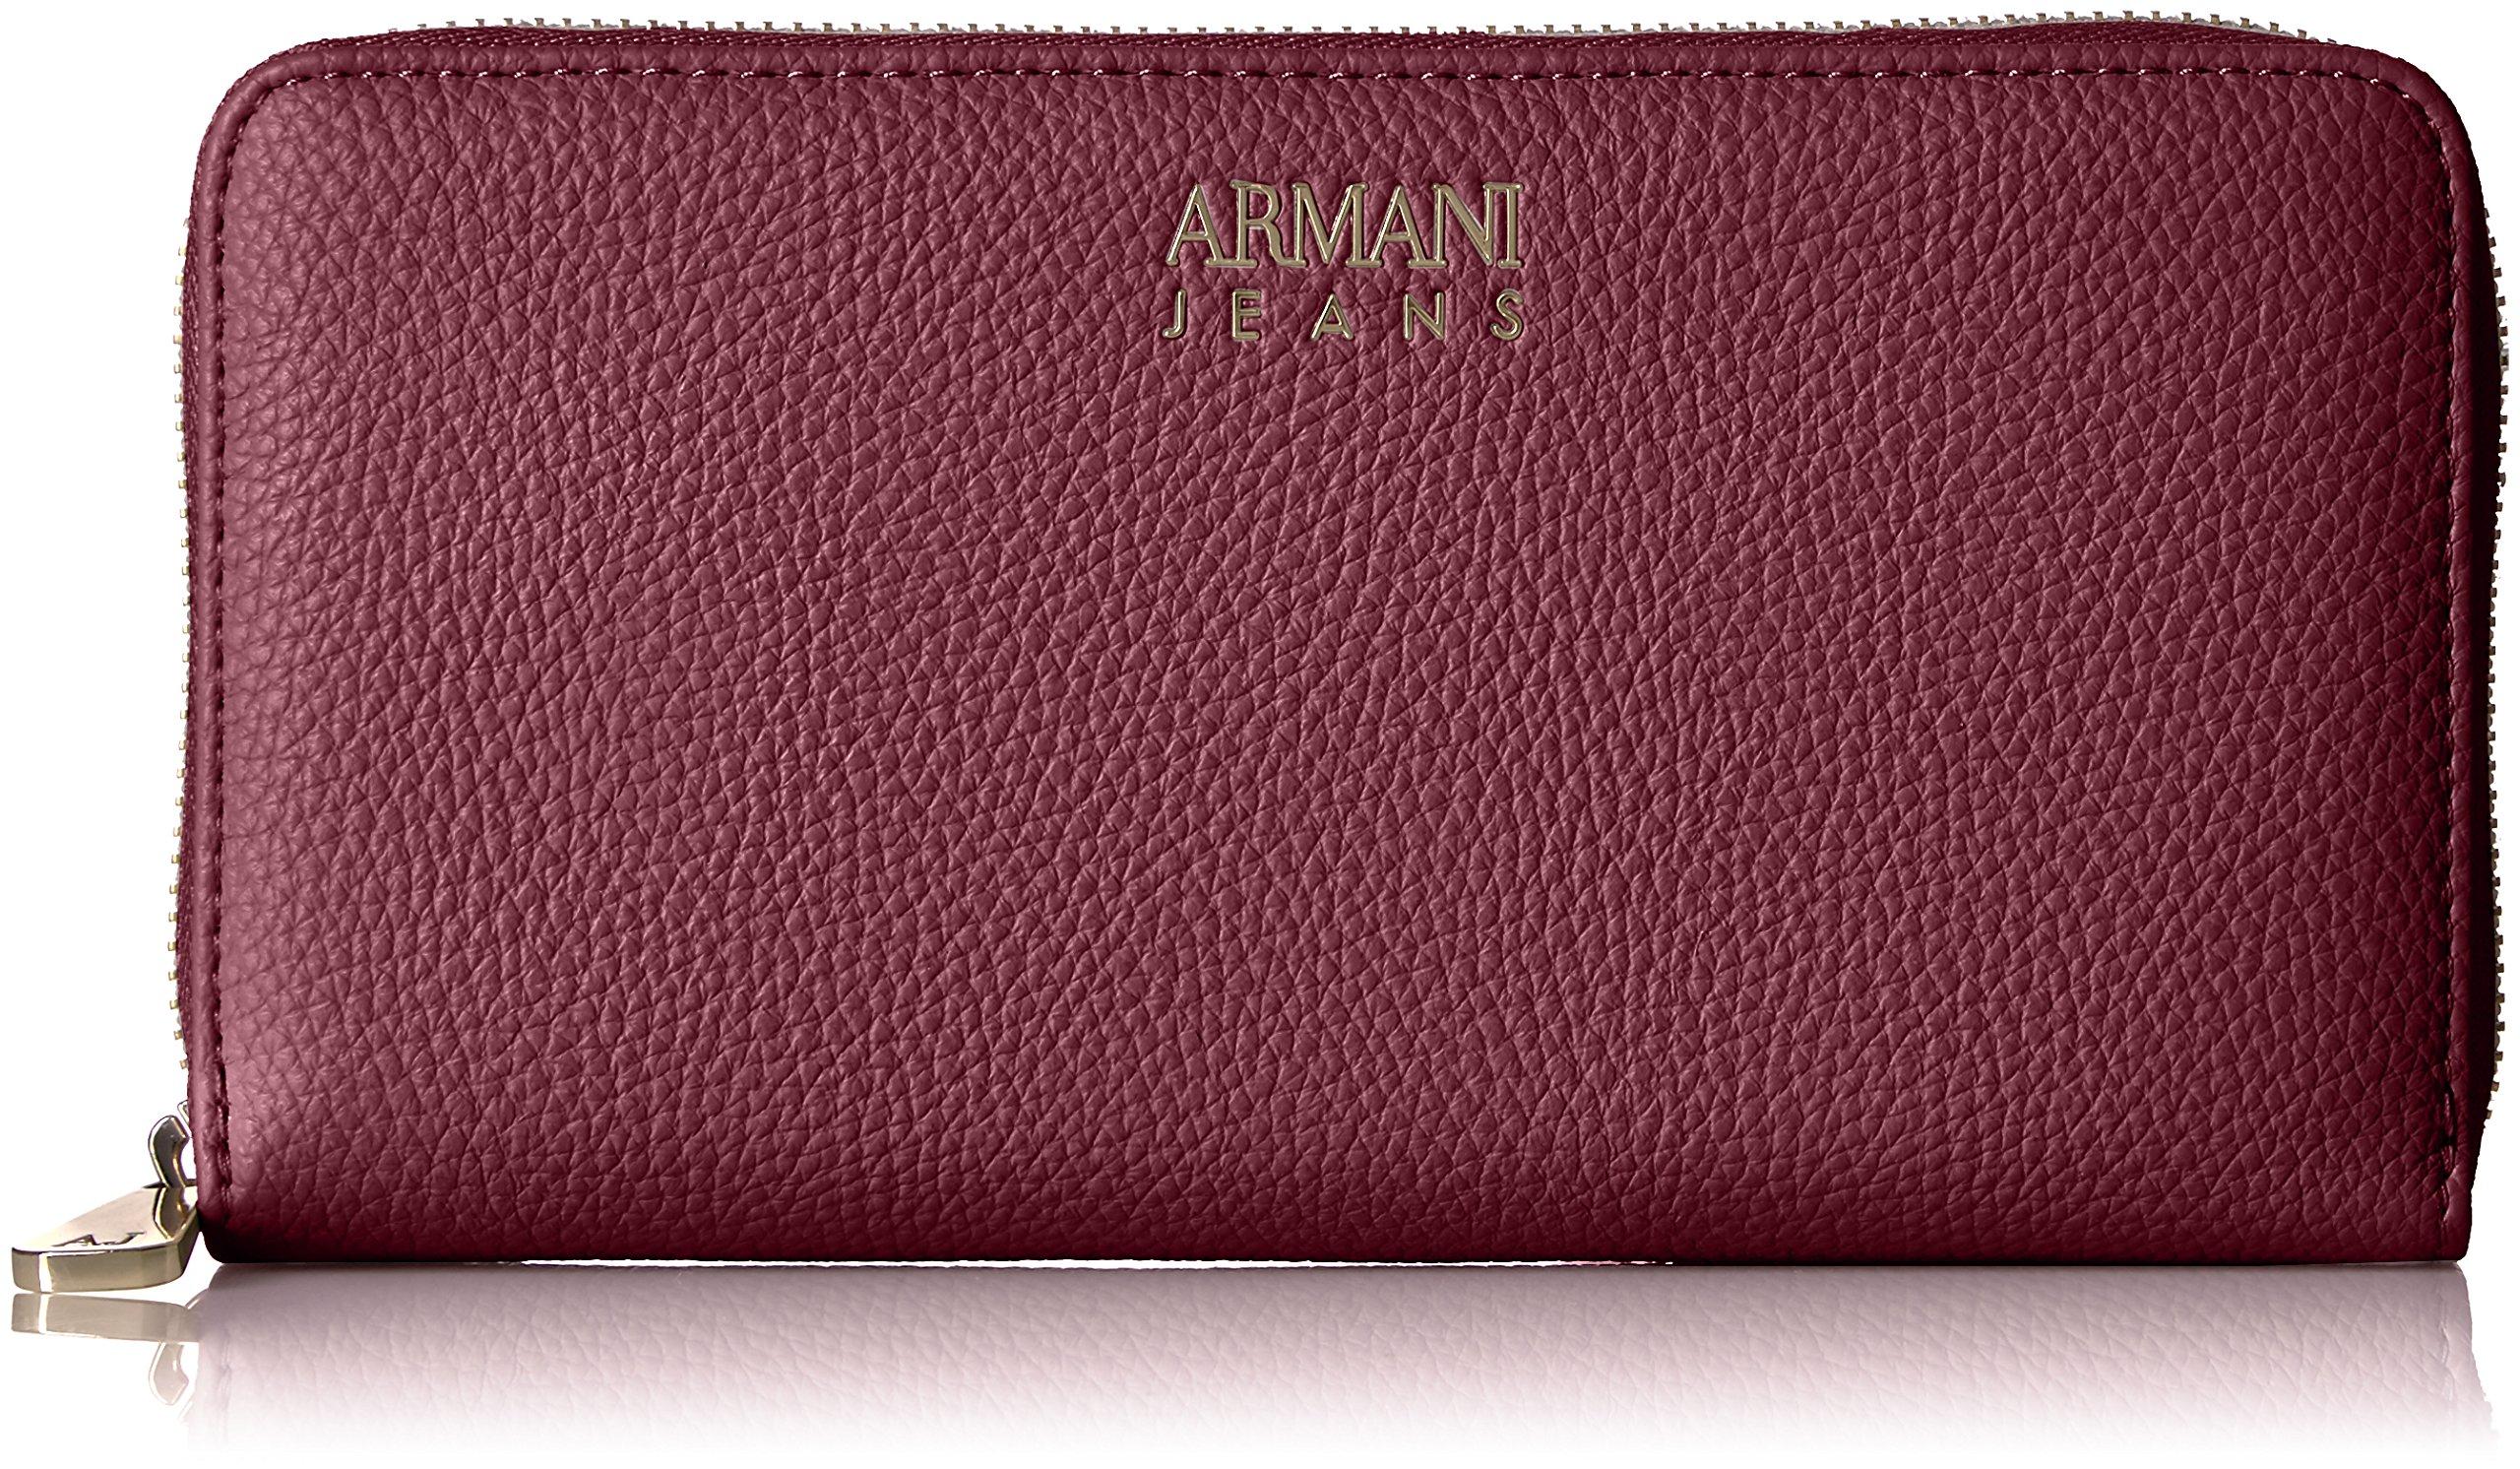 Armani Jeans Pebble Faux Leather Contential Wallet, Nero